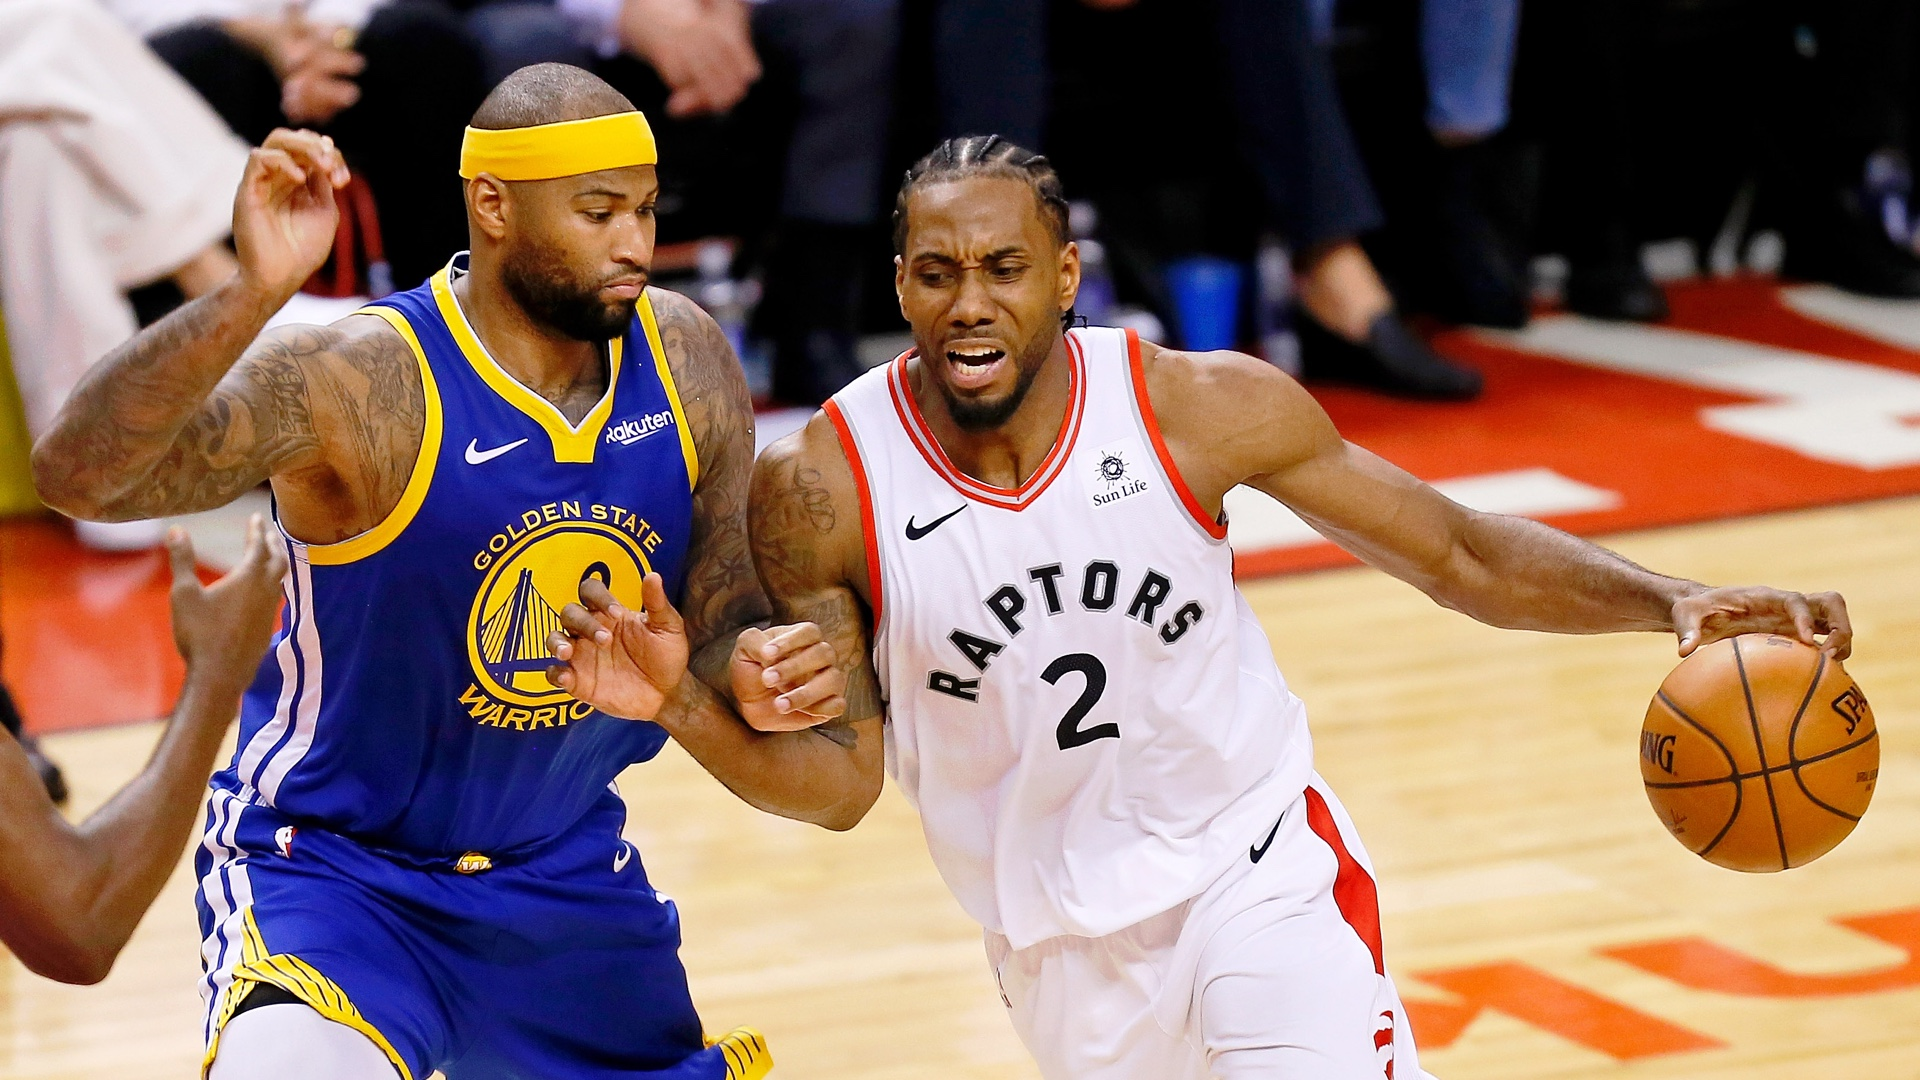 NBA Rumors: Kawhi Leonard to meet with Sixers? | 94 WIP